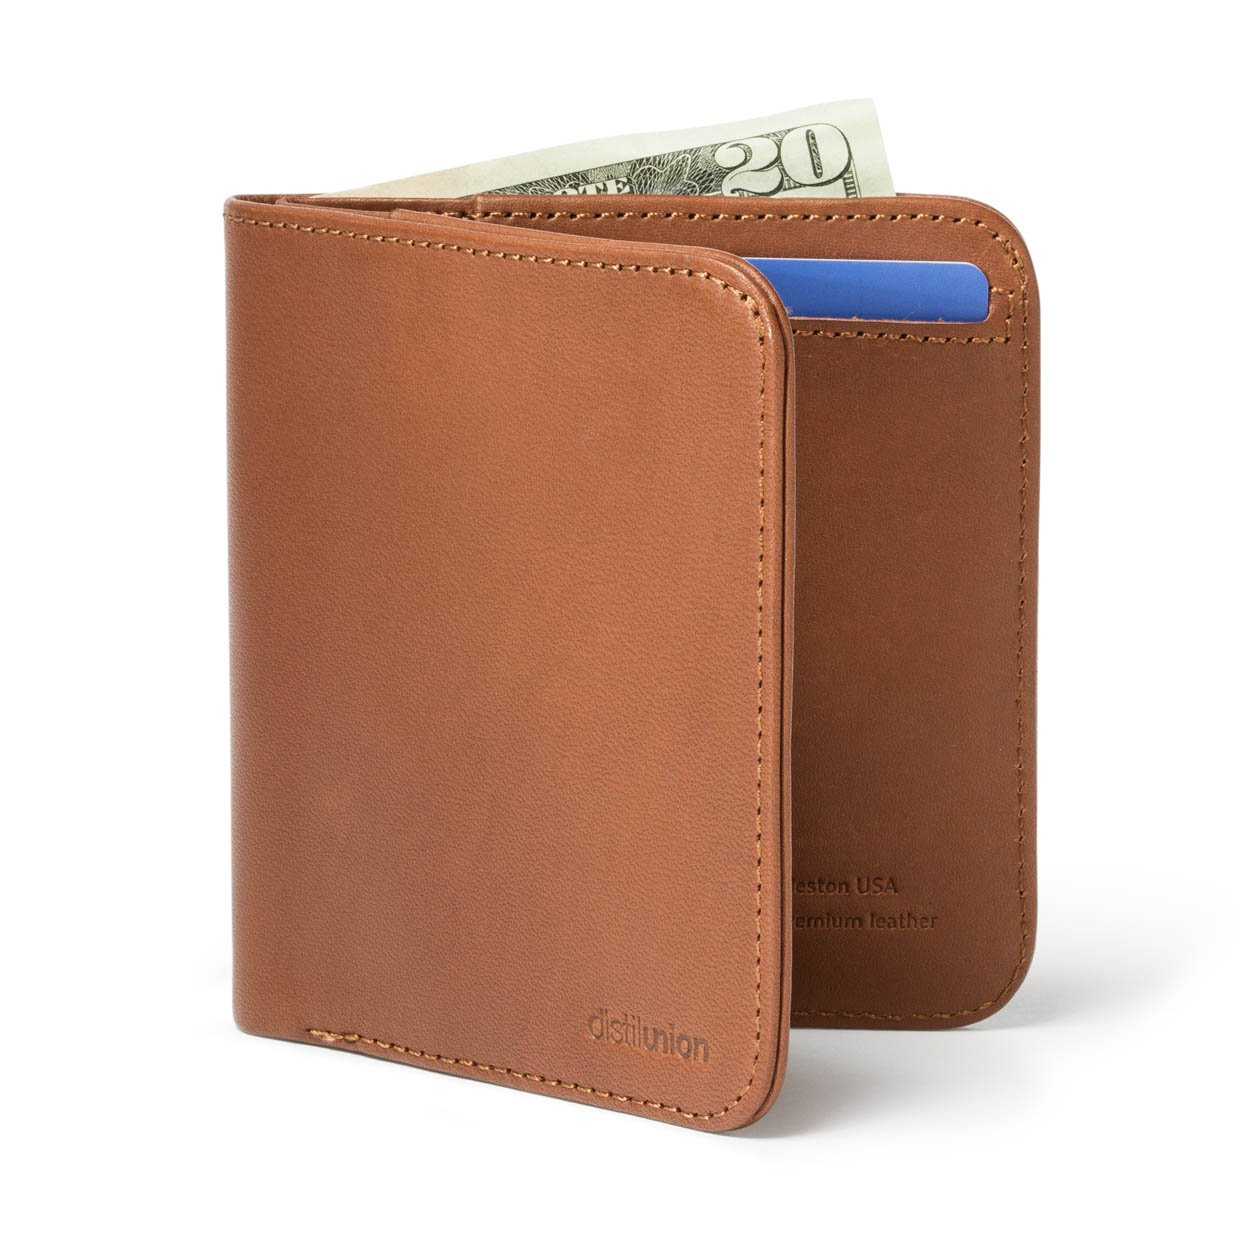 Distil Union/Wally Agent[ウォリーエージェント] メンズ 二つ折りスリム財布 お札入れ&カードホルダー B01MXEVVTJ ヒッコリー ヒッコリー